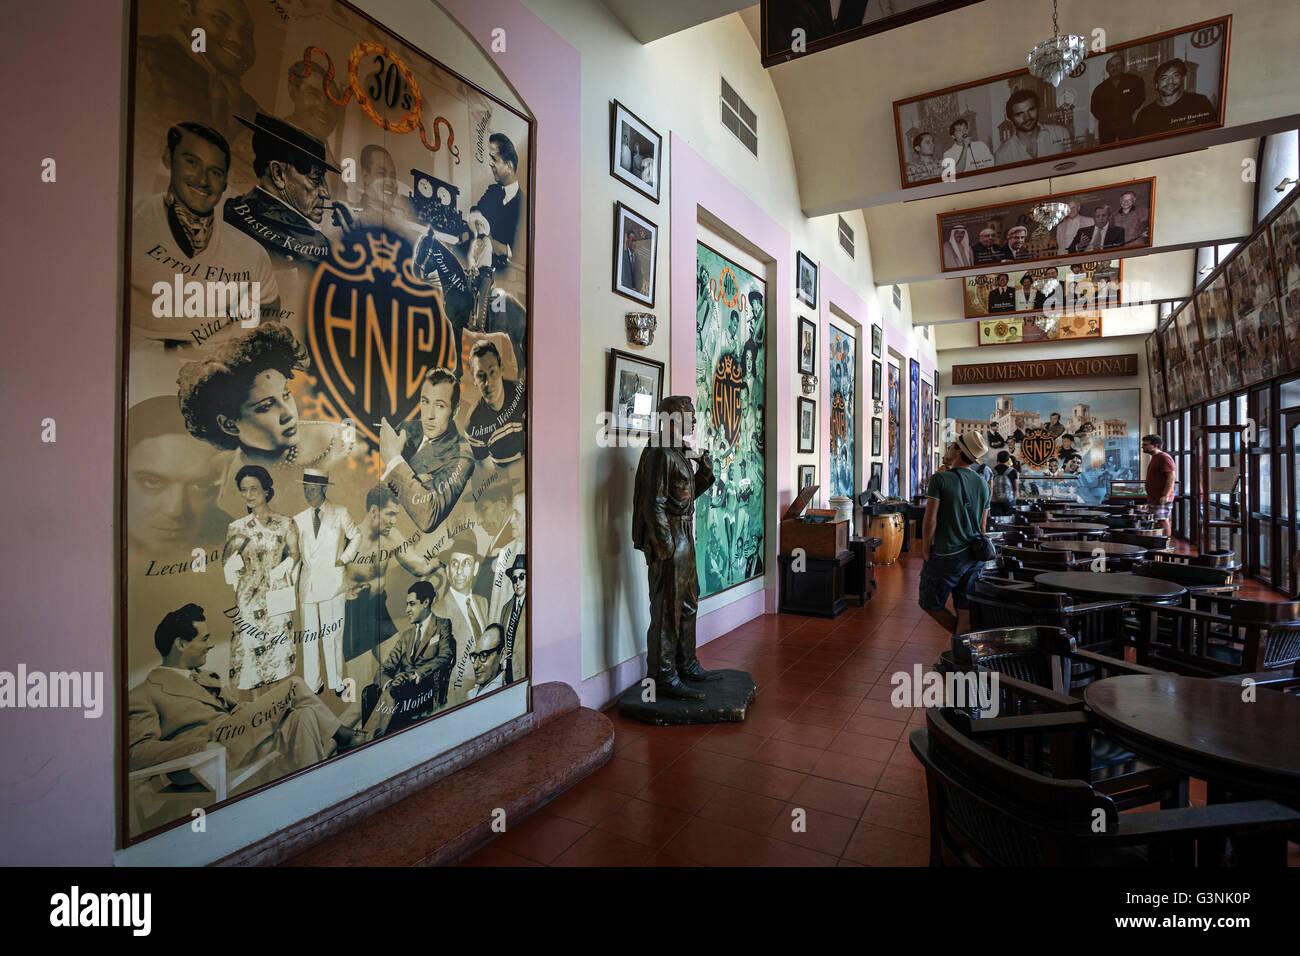 Murals in a bar hotel nacional de cuba historic luxury hotel havana cuba